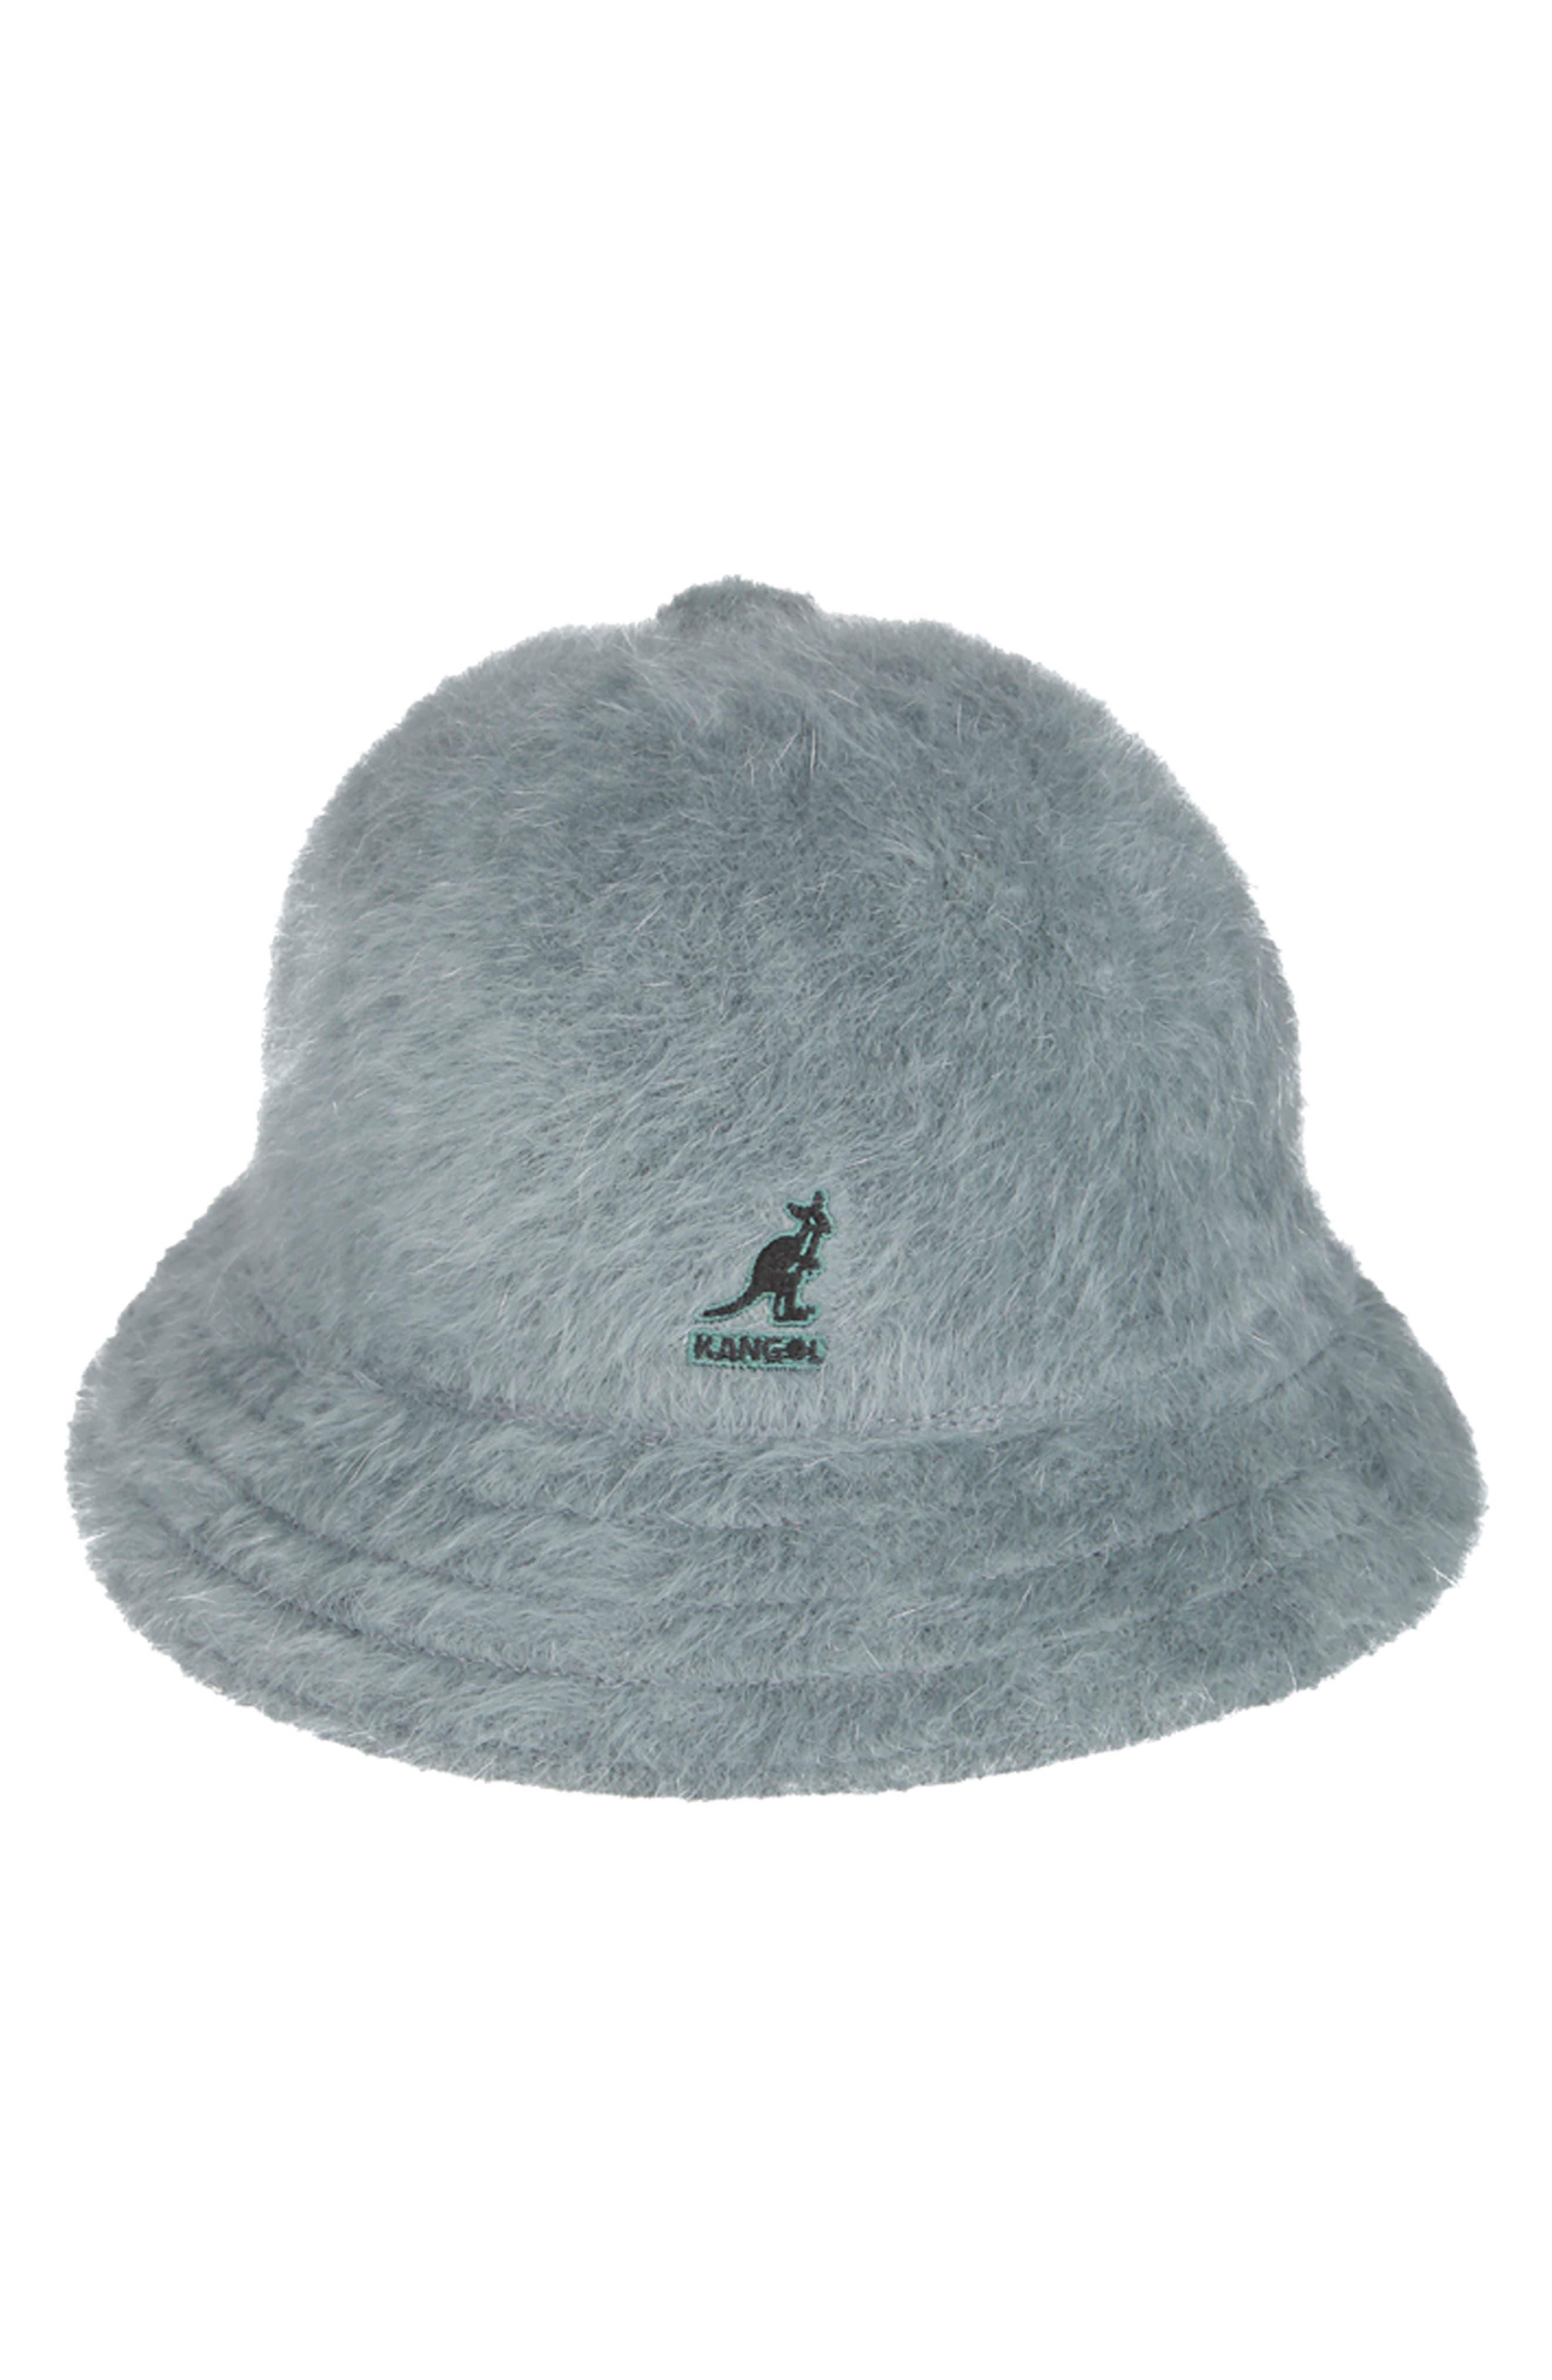 Furgora Casual Bucket Hat,                             Main thumbnail 1, color,                             SLATE GREY